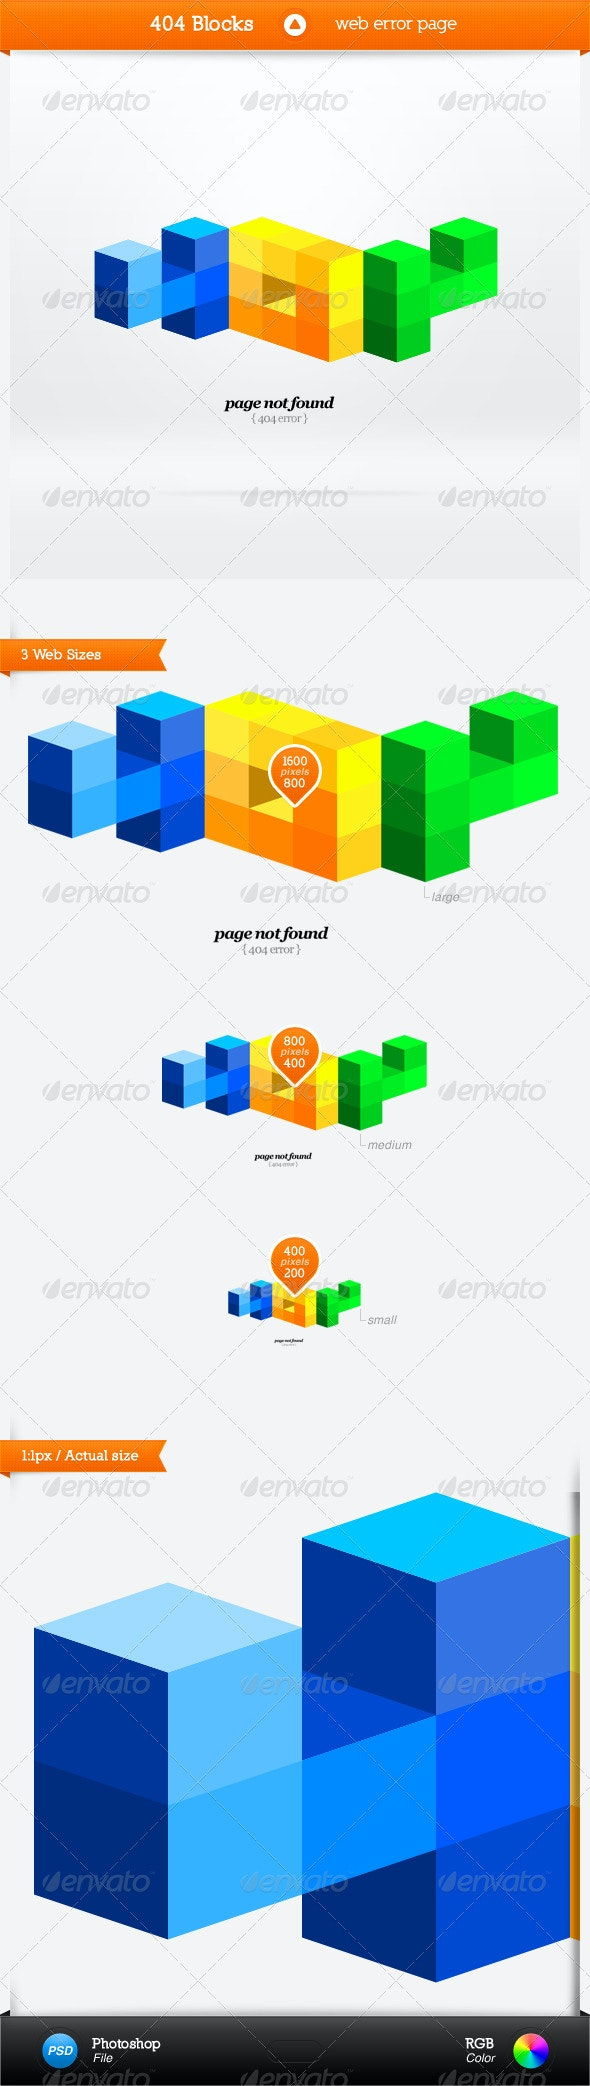 404 Blocks - error page - 404 Pages Web Elements